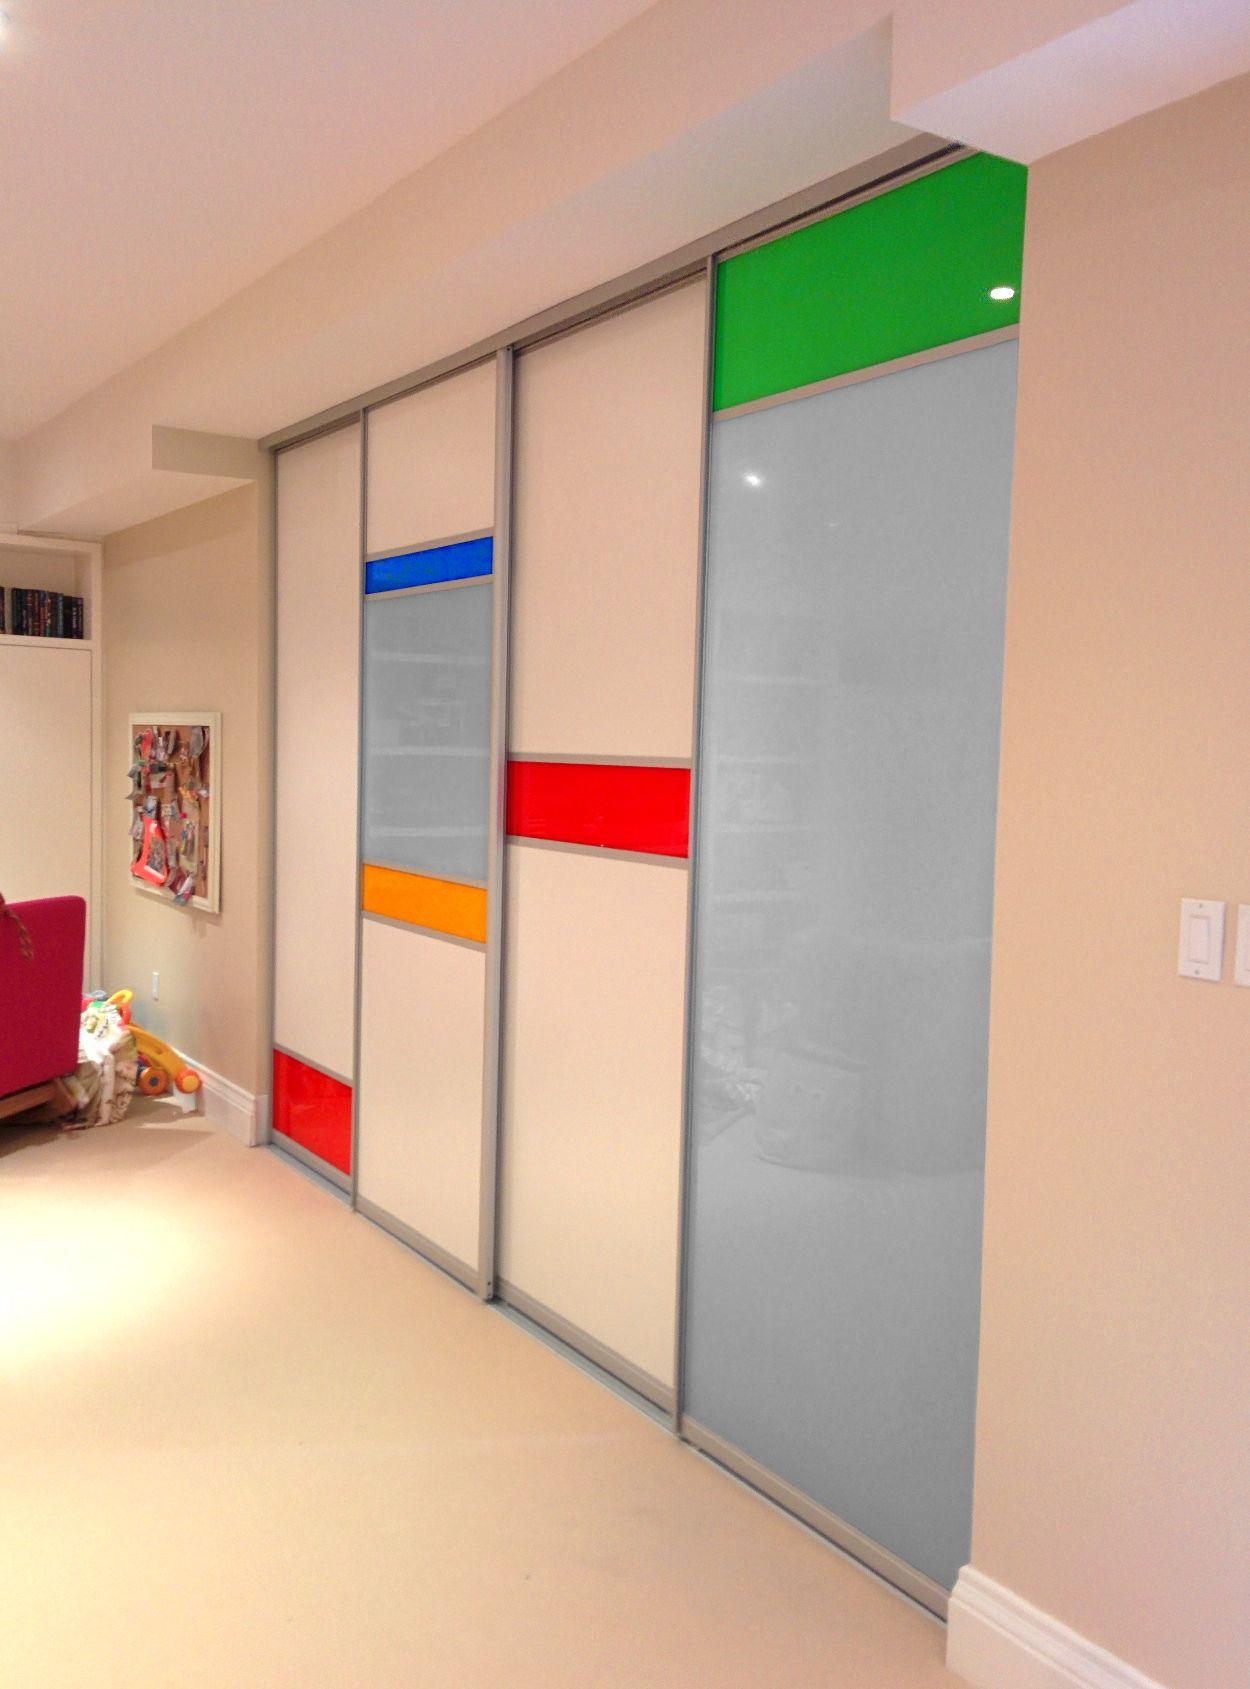 image result for back painted glass wardrobe designs amamosvidro